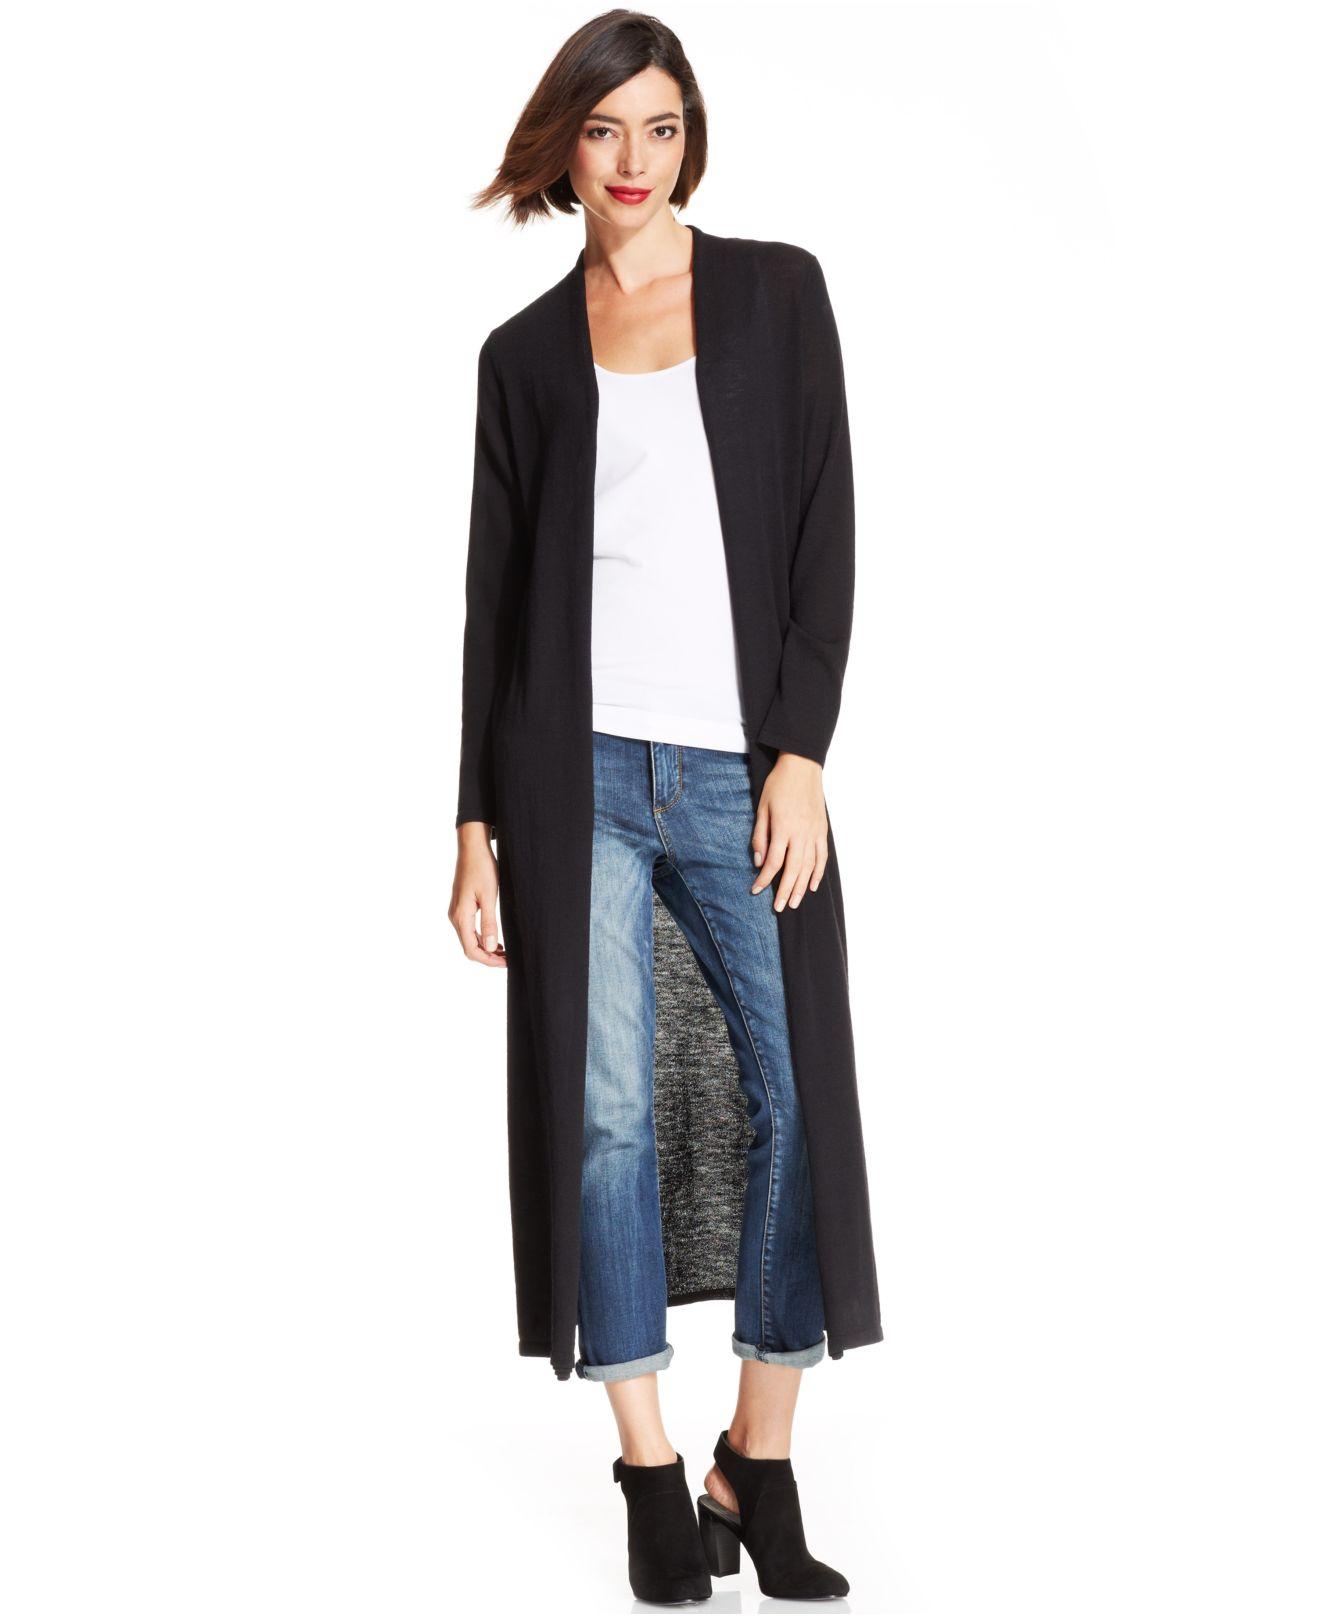 Eileen fisher Merino-Wool Maxi Cardigan in Black | Lyst